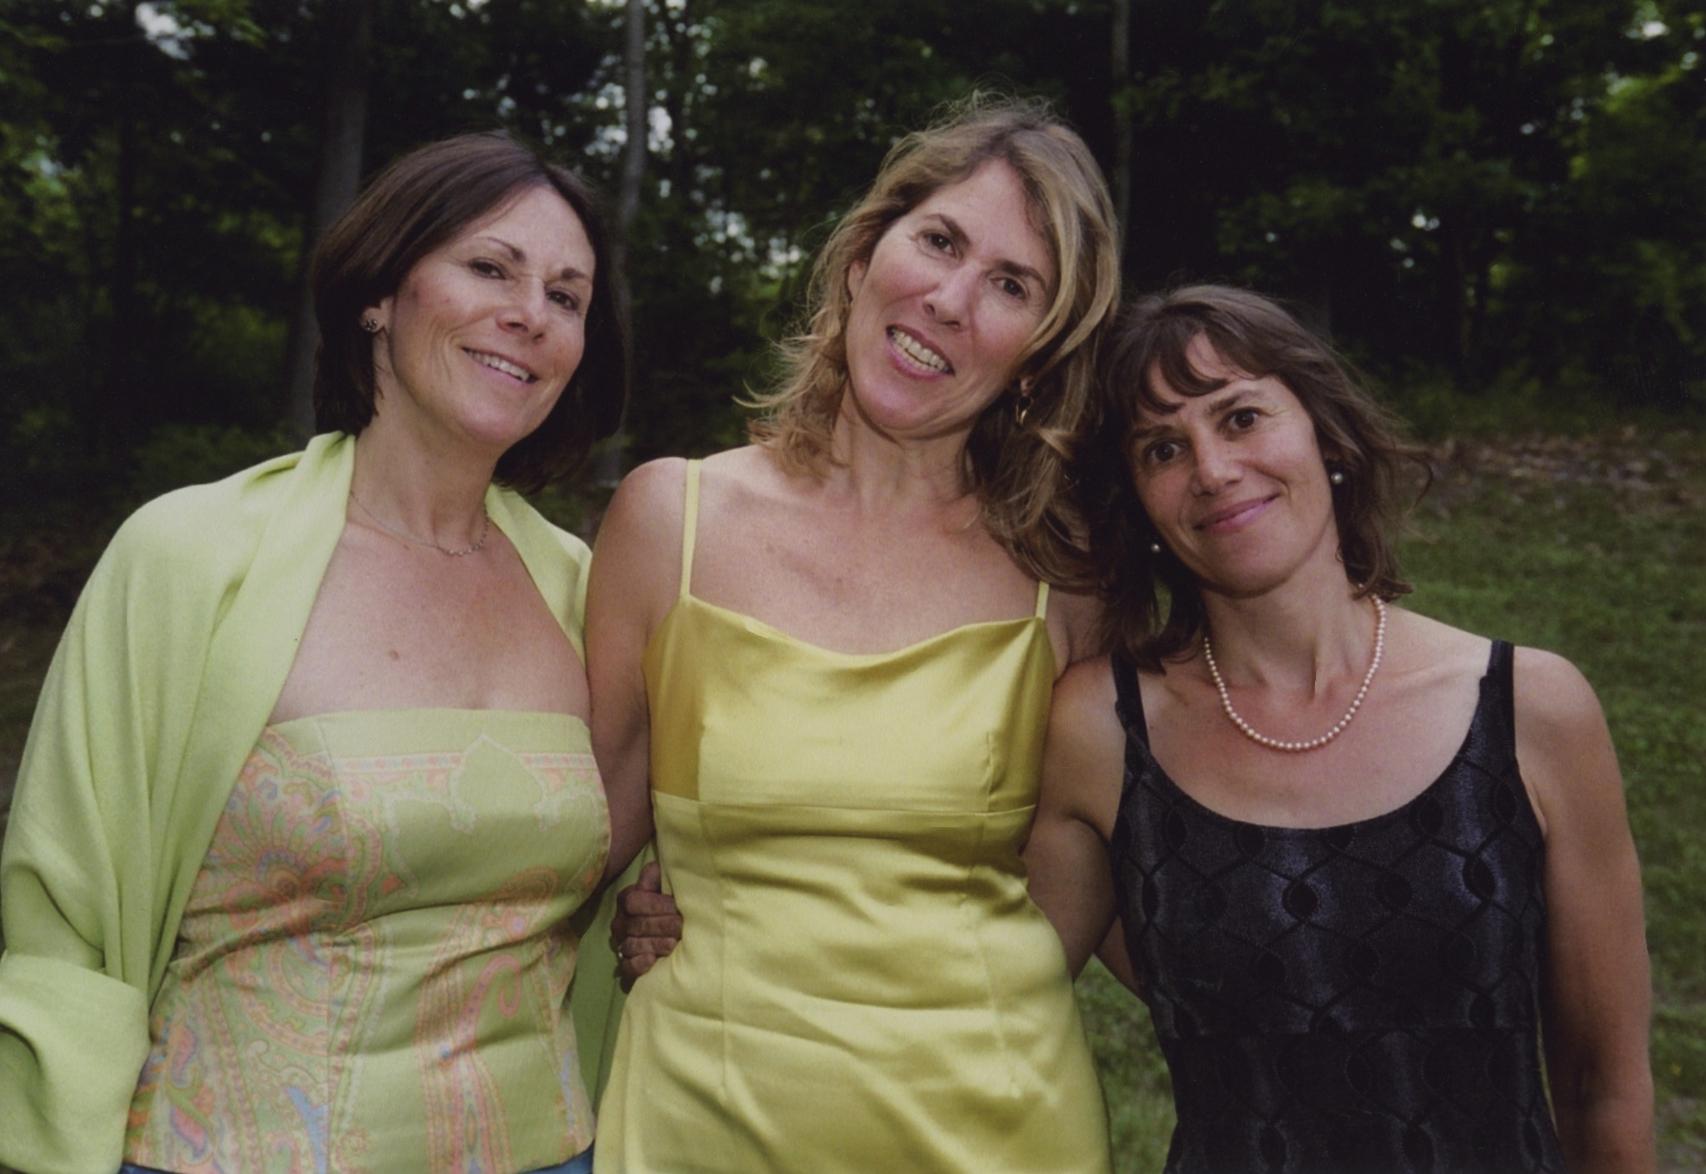 Katy, Liz and Maggie